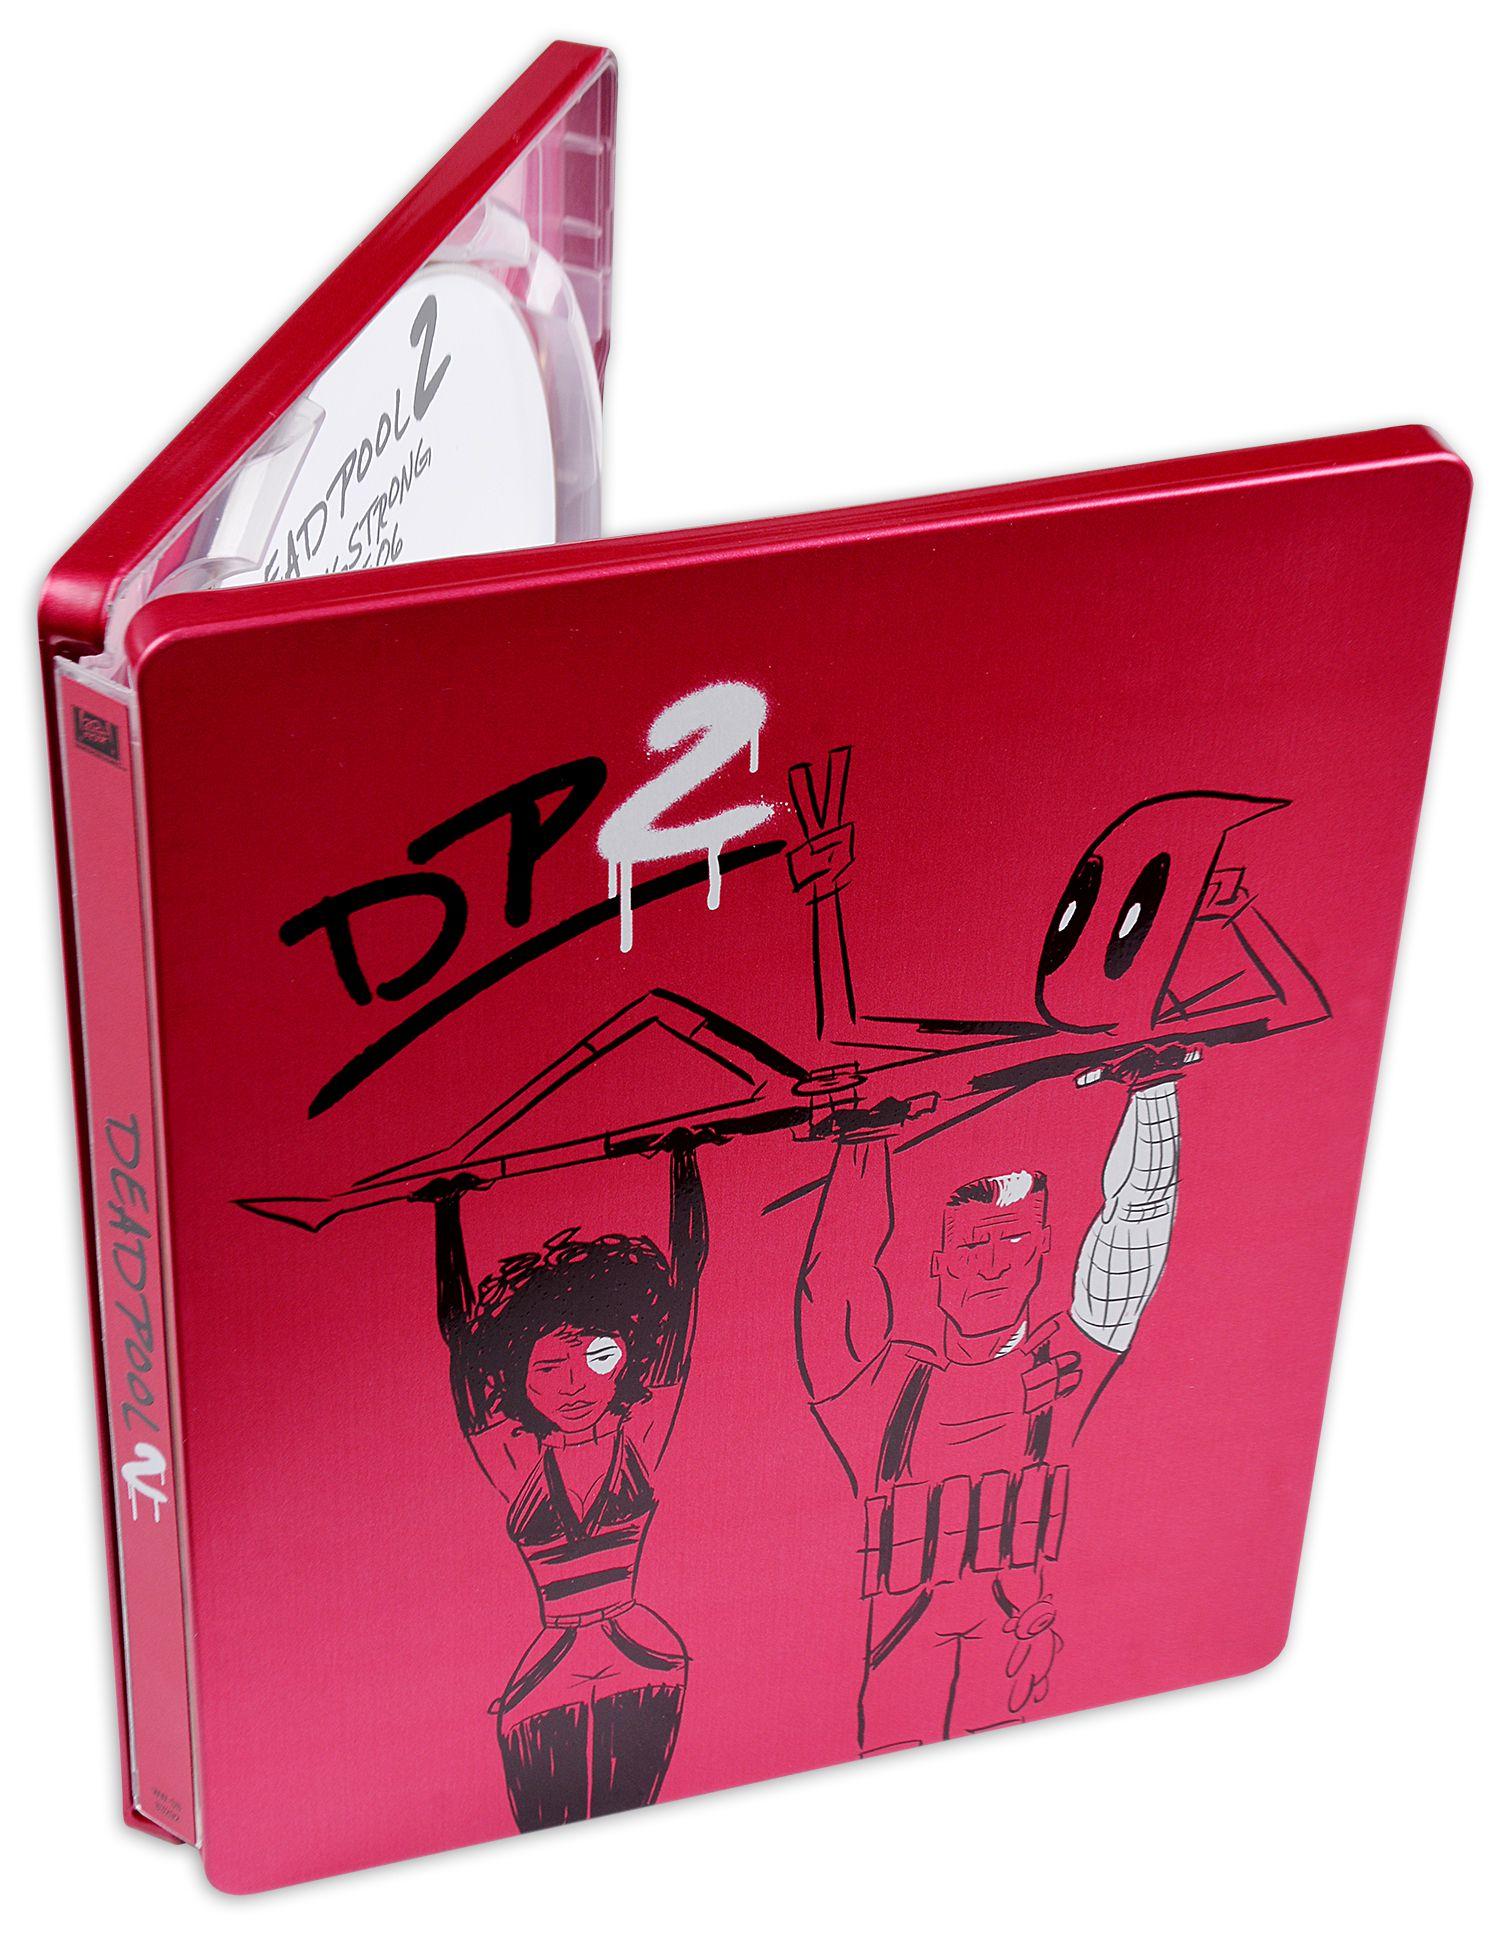 Дедпул 2 (Steelbook Edition) - 4